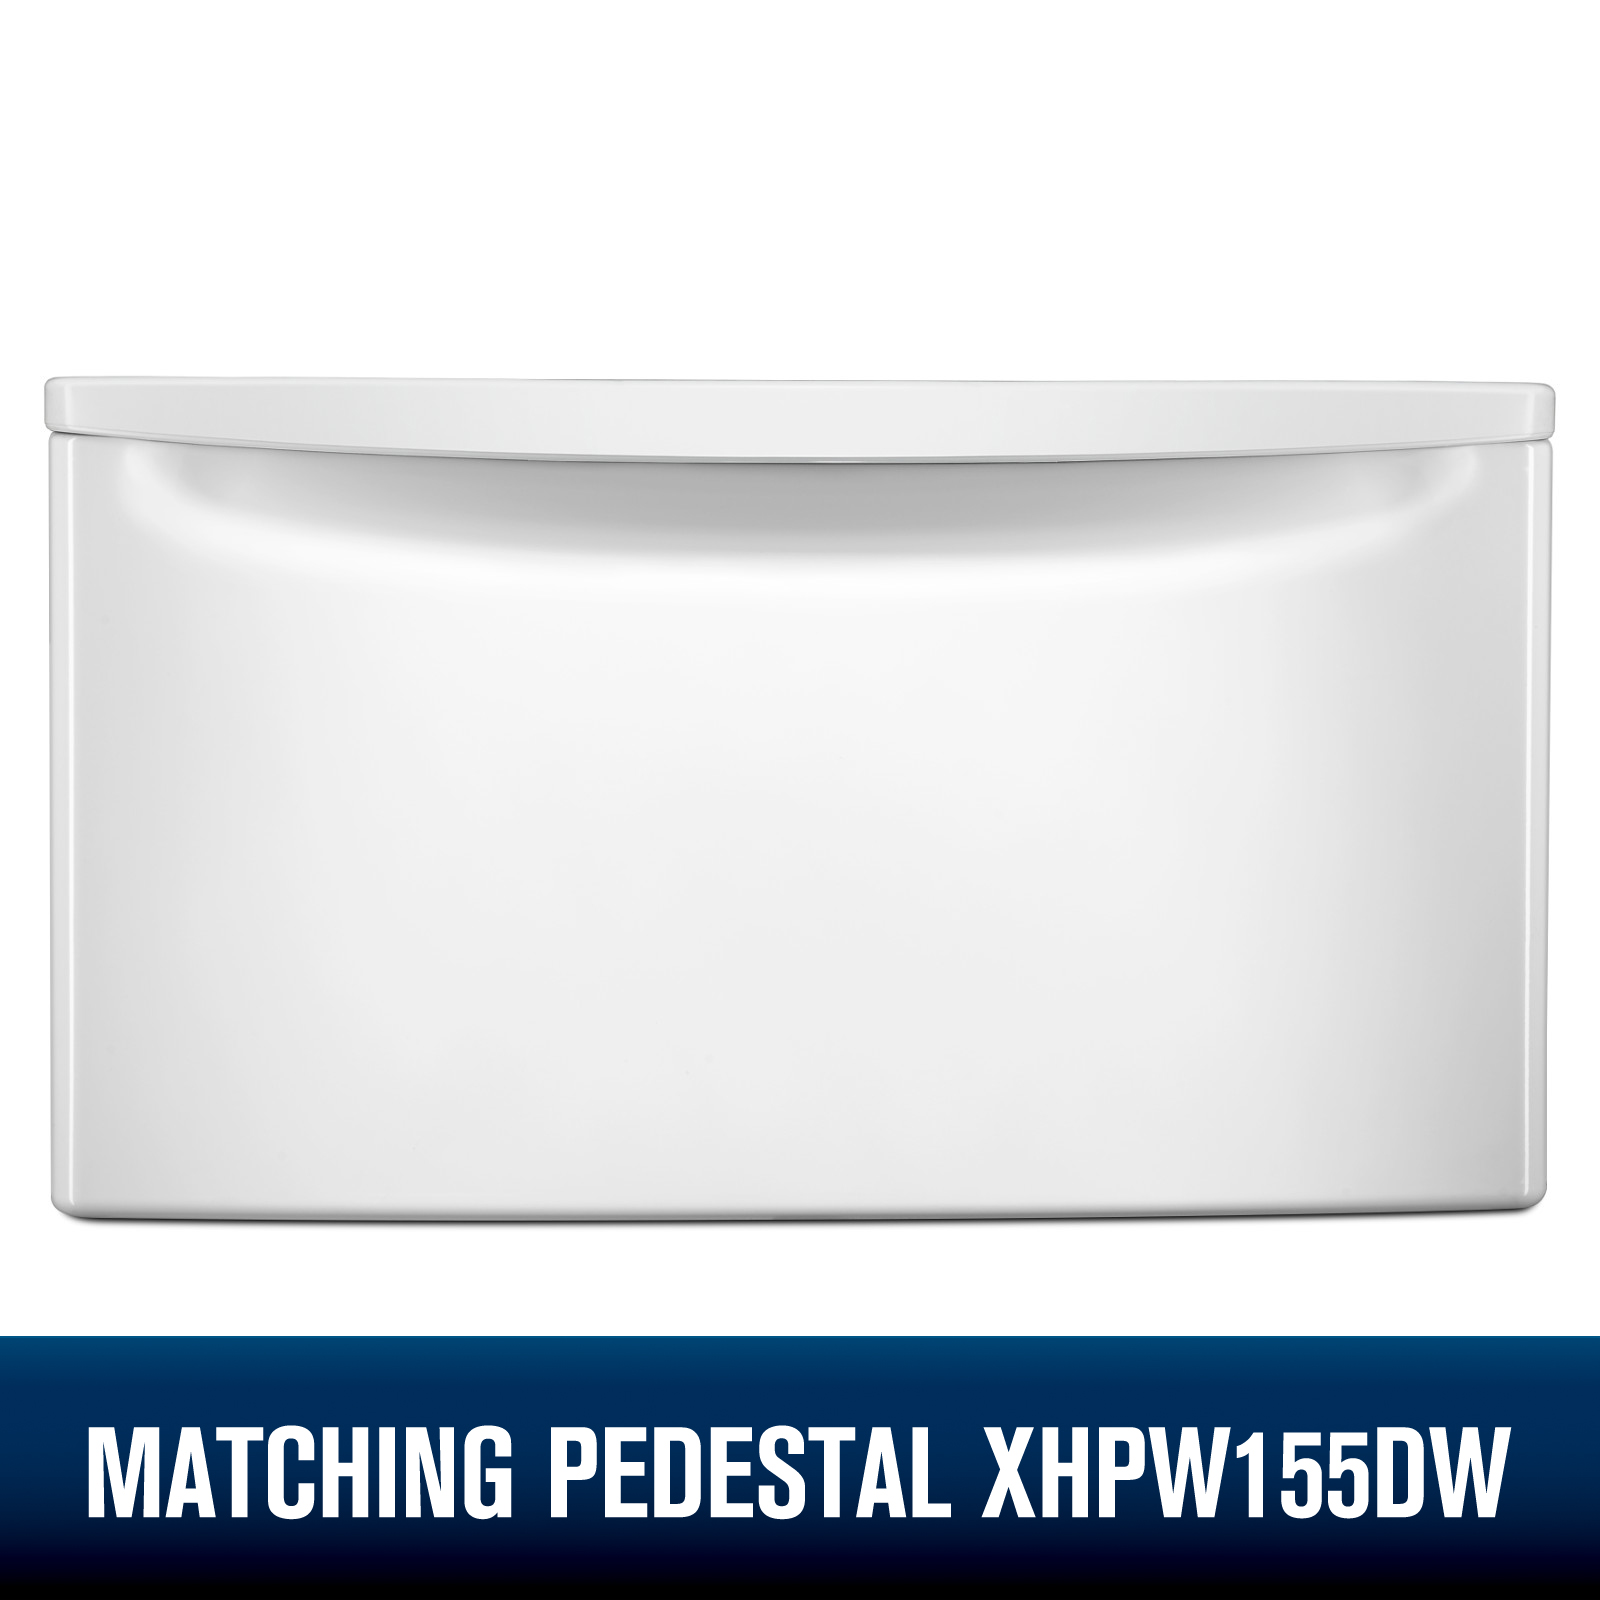 Whirlpool WED9290FW 7.4 cu. ft. HybridCare True Ventless Heat Pump Dryer - White